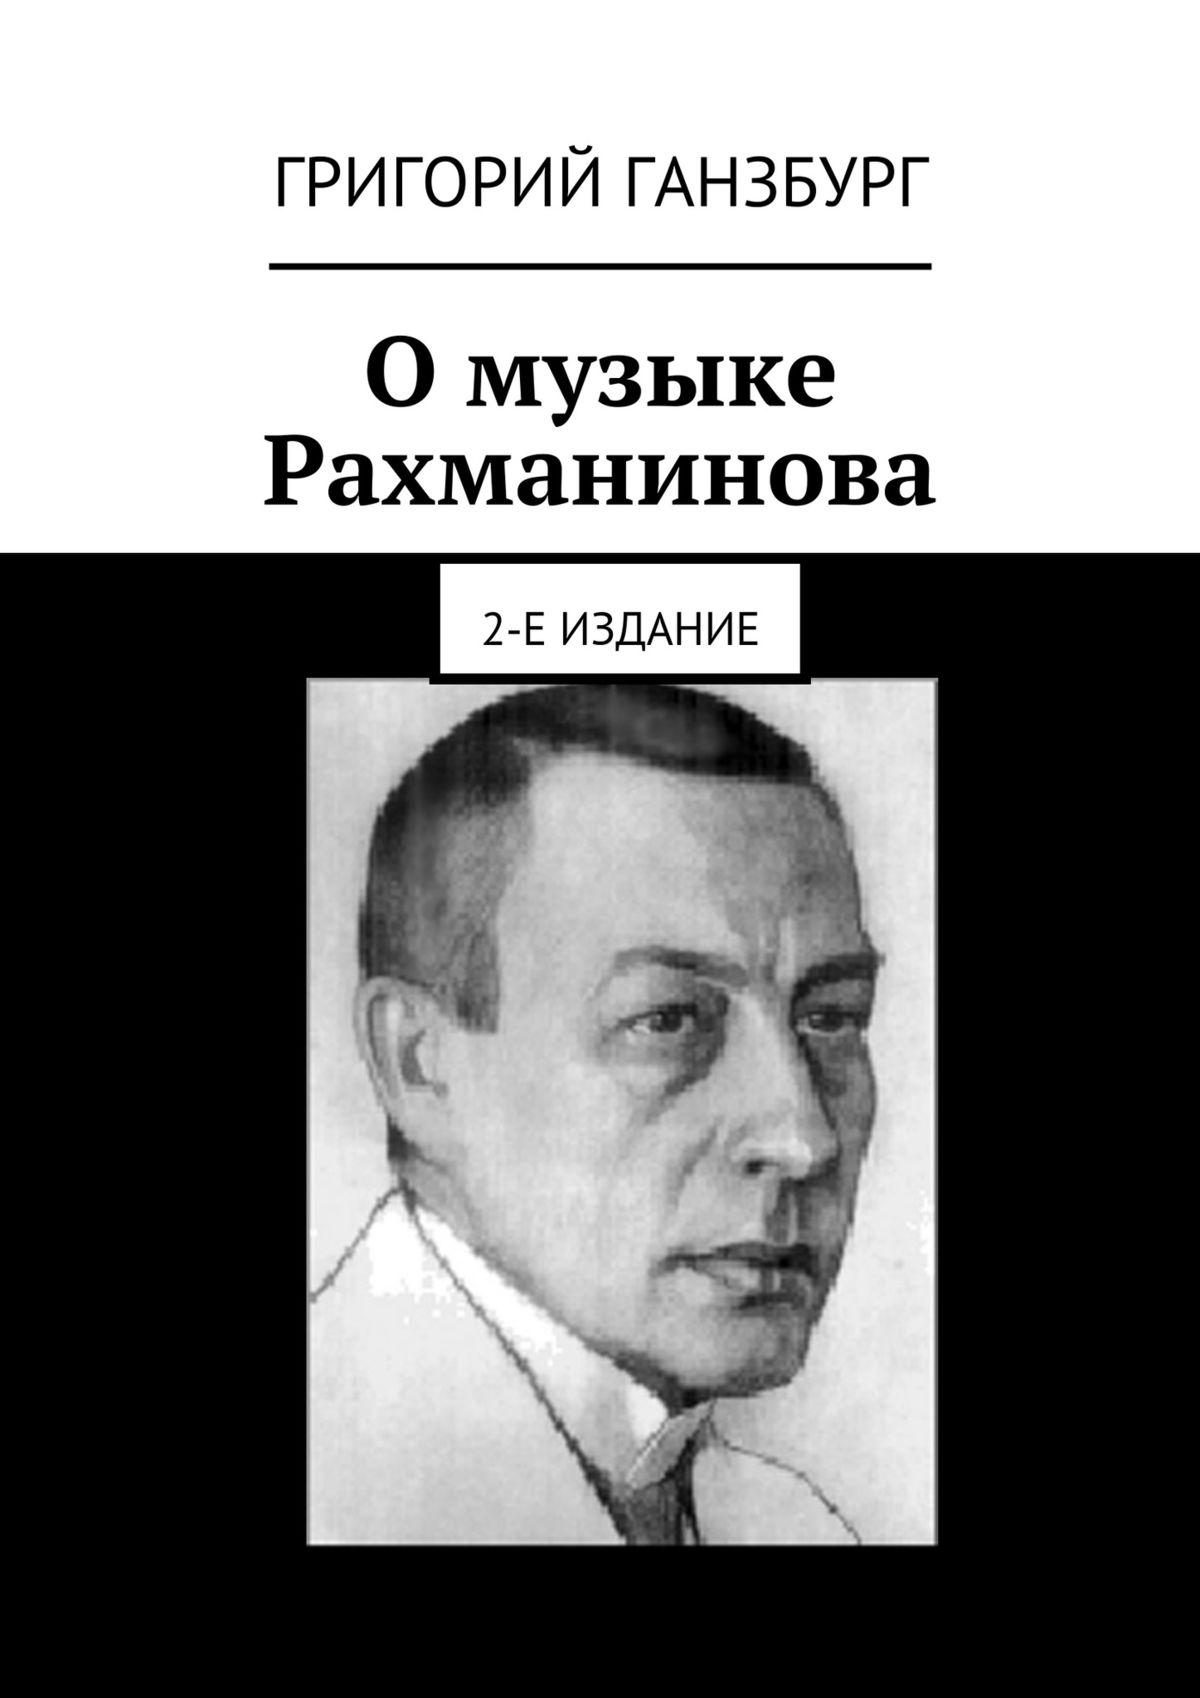 Омузыке Рахманинова. 2-е издание